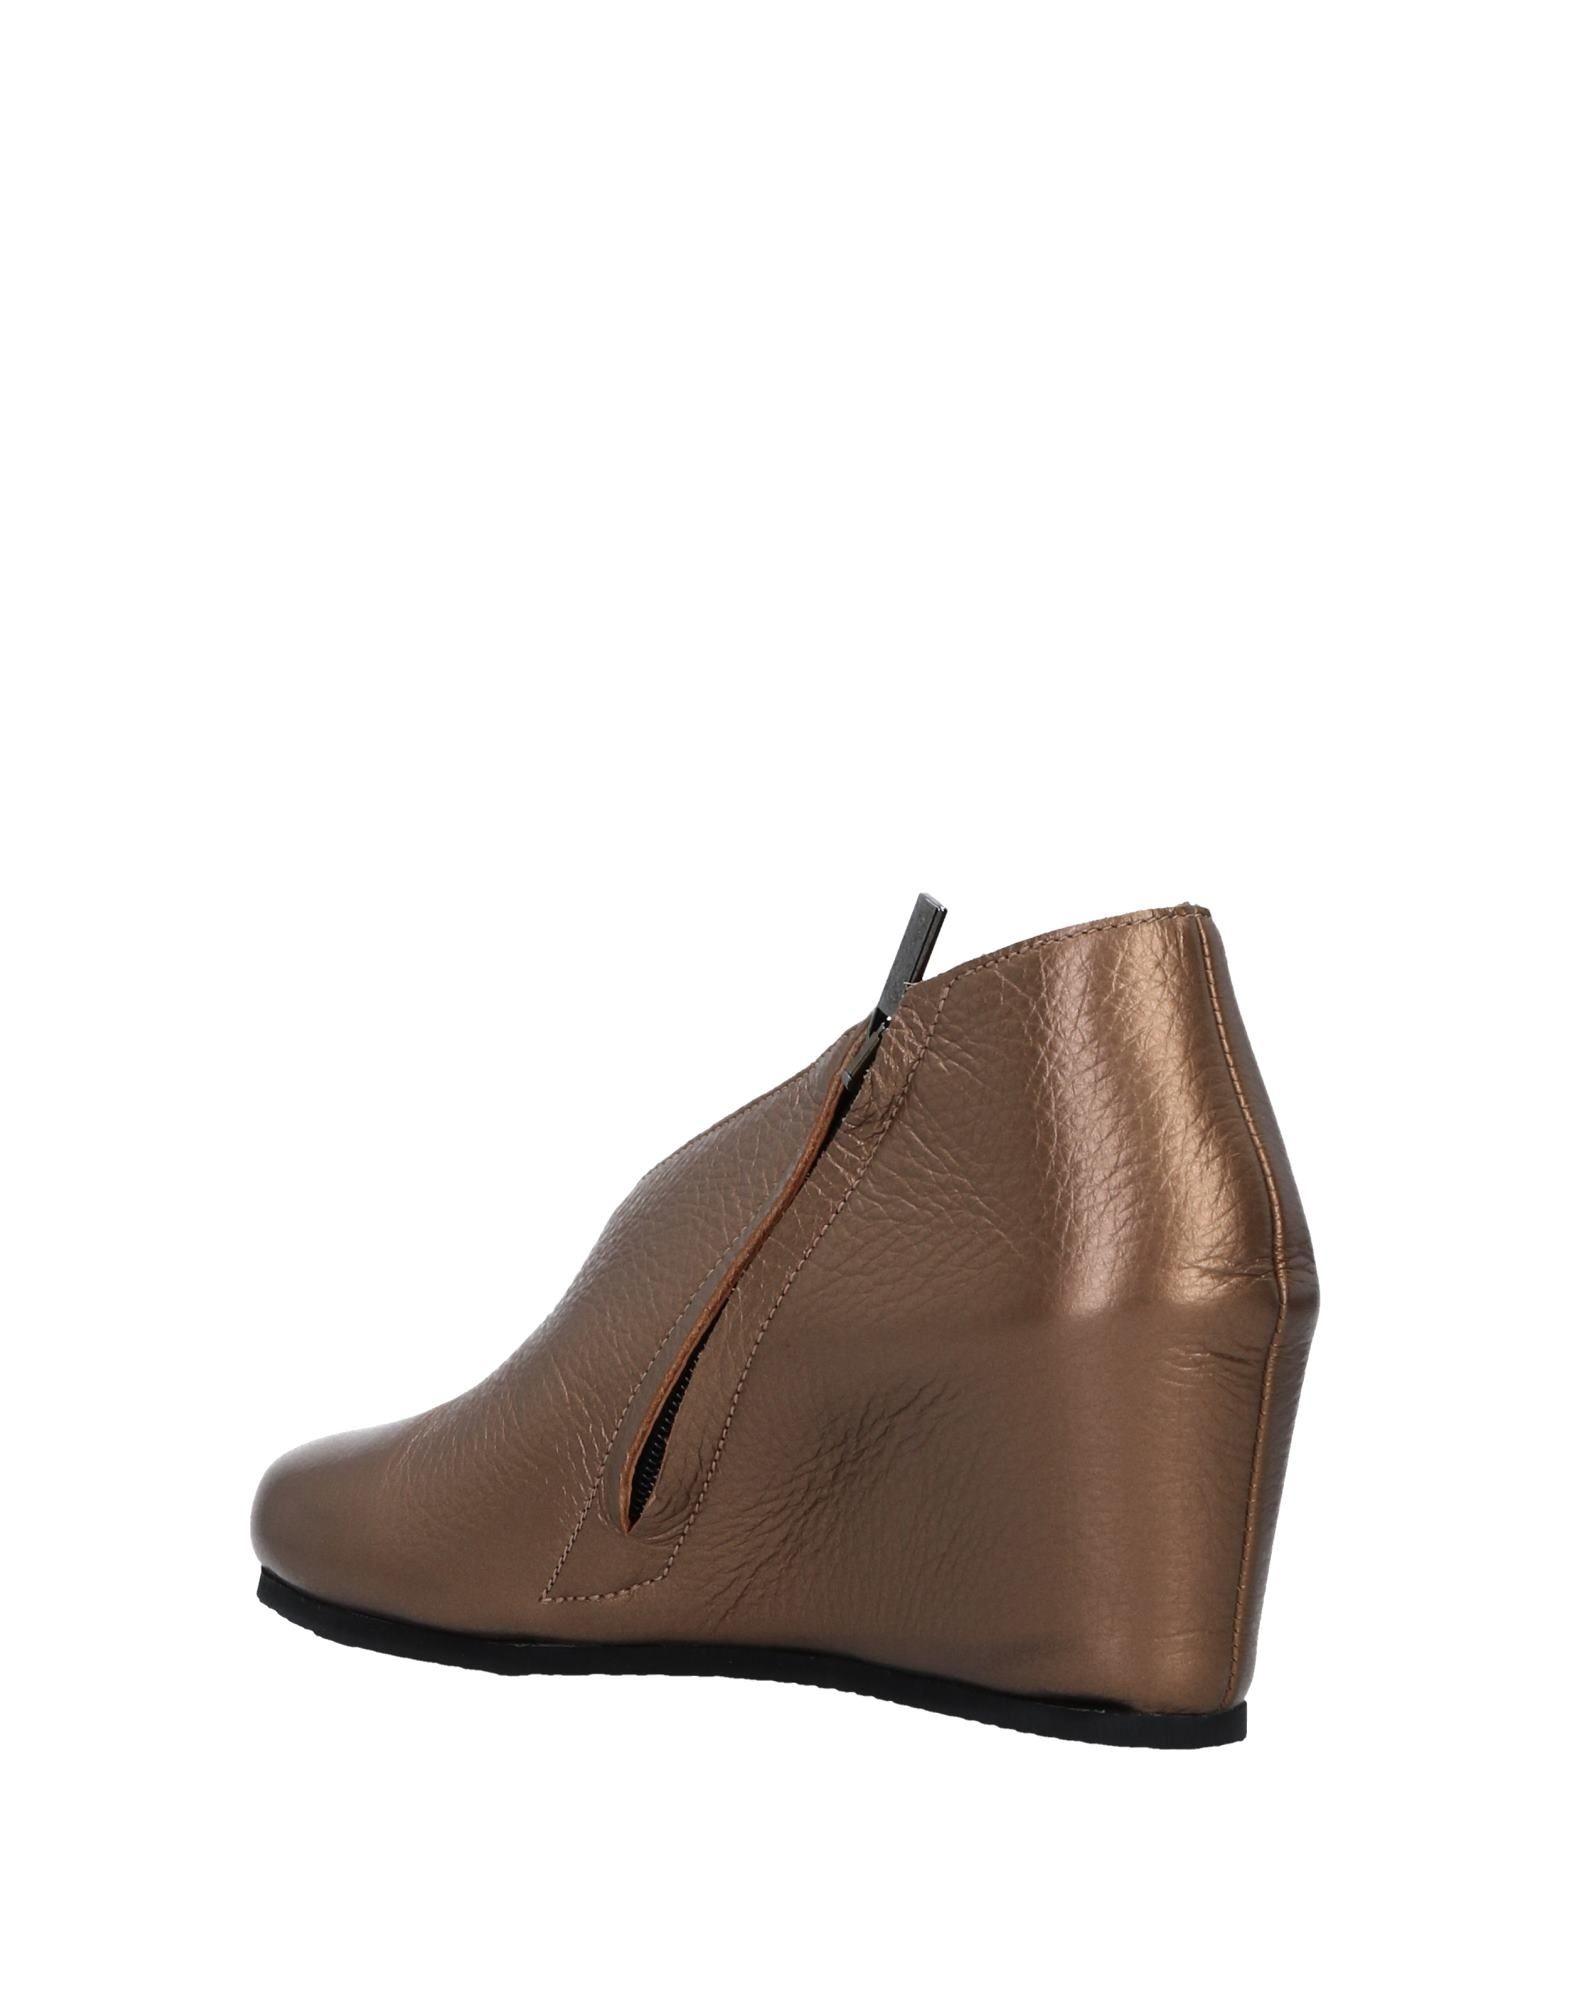 Rabatt Schuhe Peter 11527284BJ Non Stiefelette Damen  11527284BJ Peter f35506